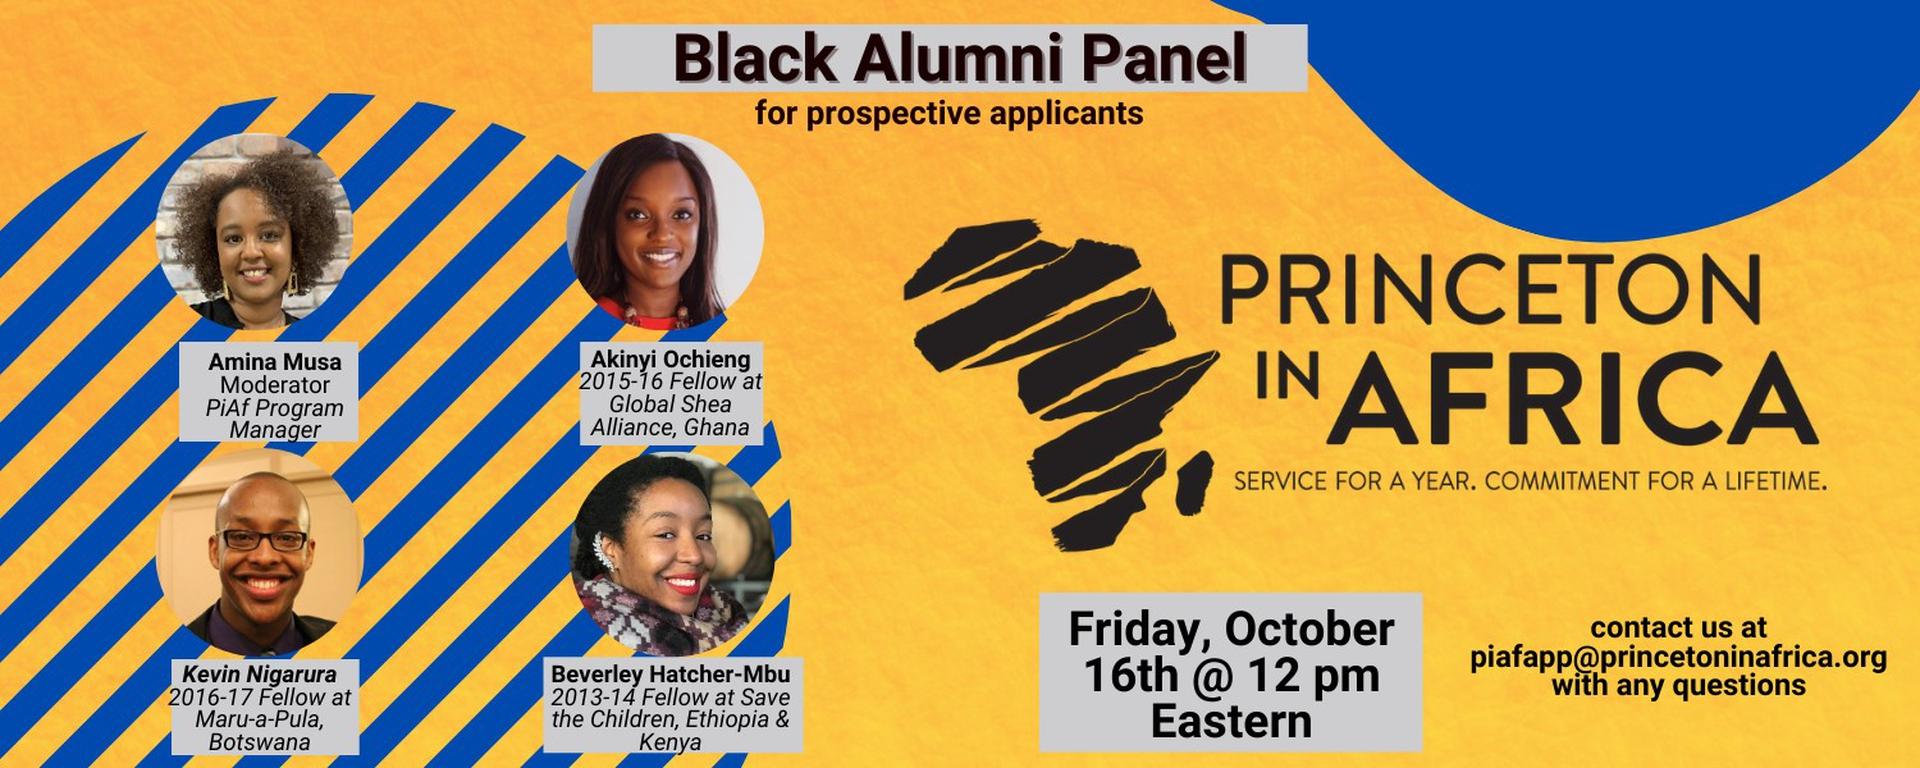 Princeton in Africa - Black Alumni Panel for prospective PiAf applicants Movemeback African event cover image